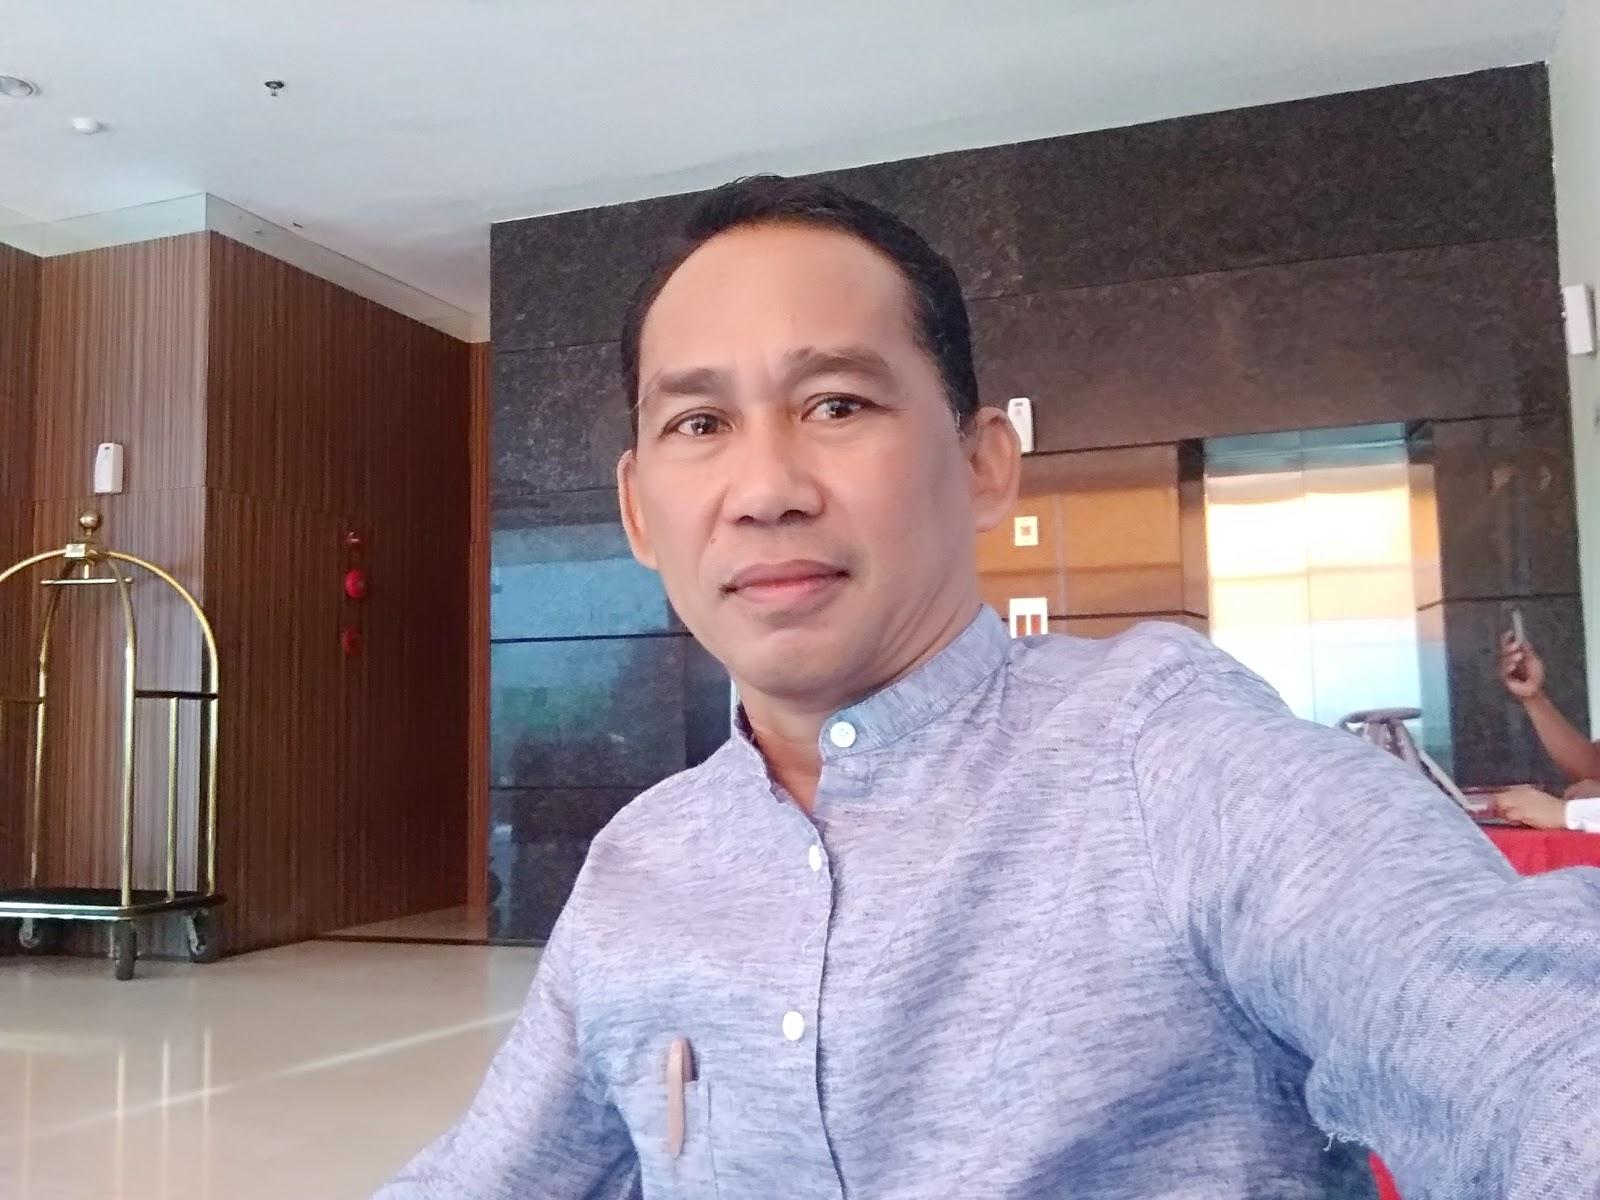 Sekretaris IWO Soppeng Ucapkan Bela Sungkawa Atas Meninggalnya Pimpinan Redaksi Media Online JNN.co.id